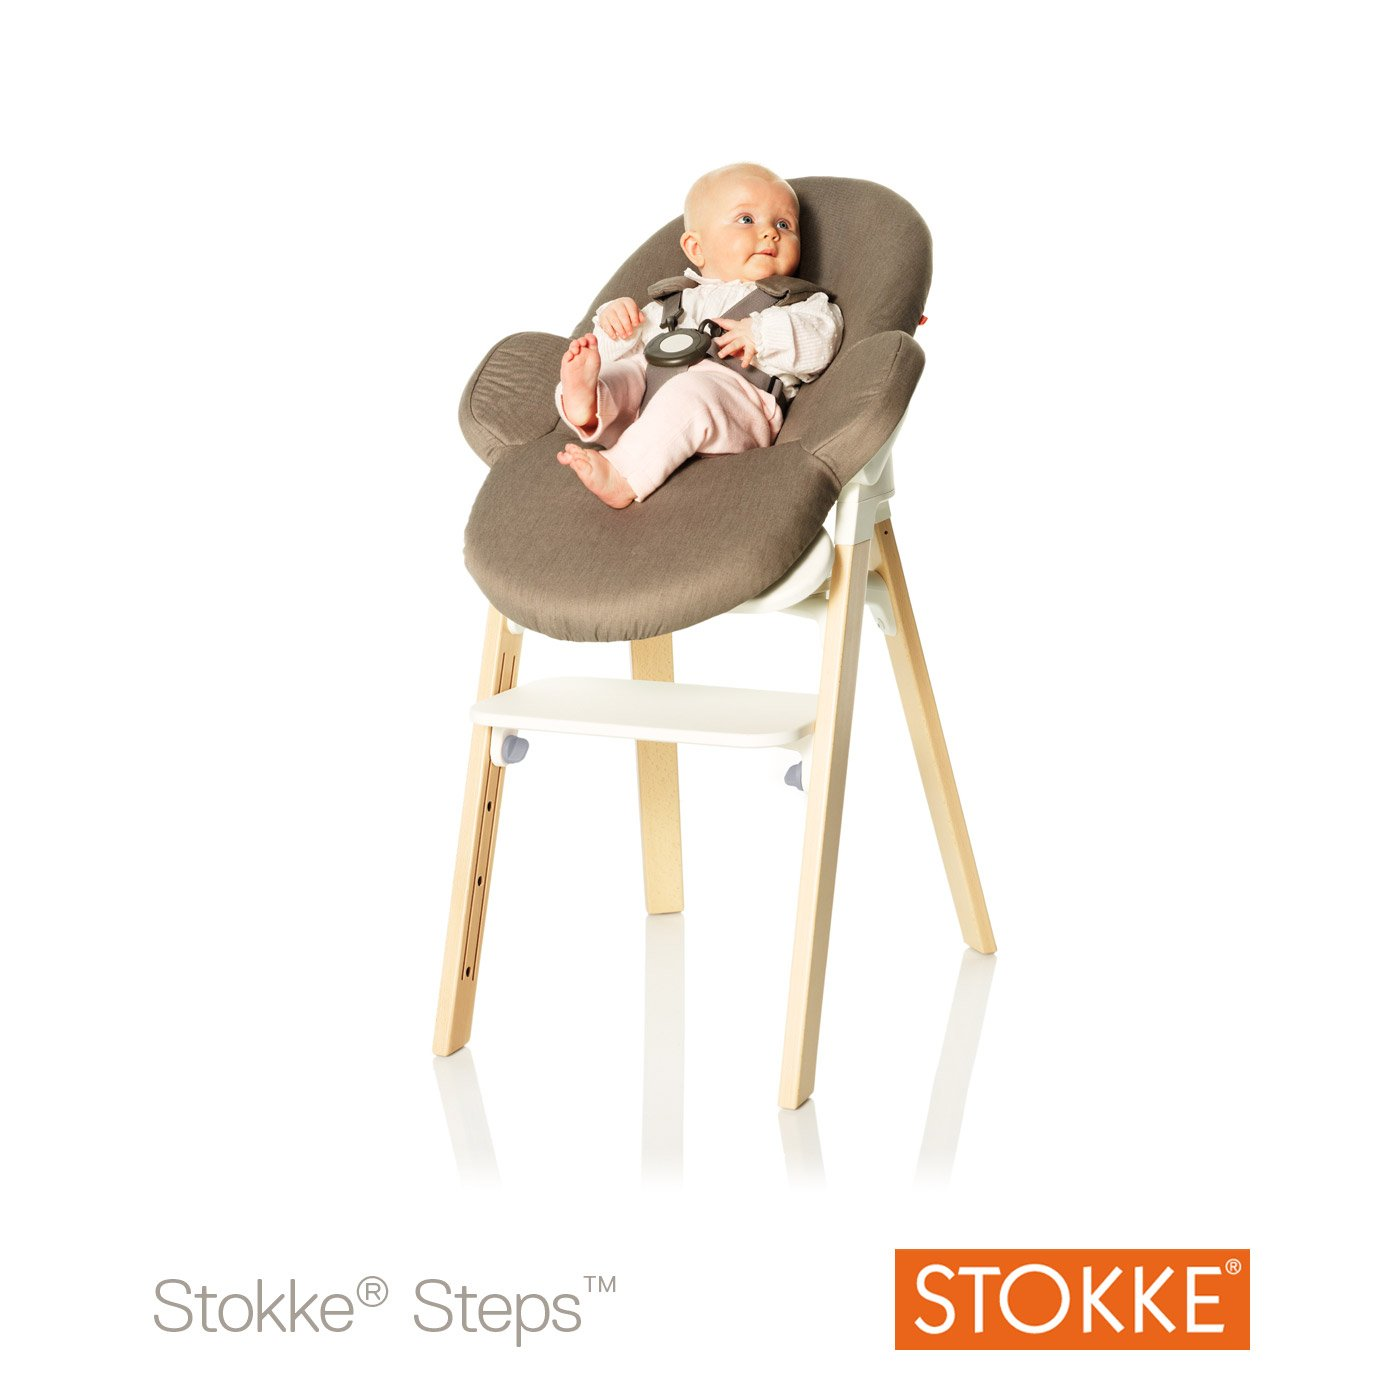 transat steps bleu de stokke transats aubert. Black Bedroom Furniture Sets. Home Design Ideas